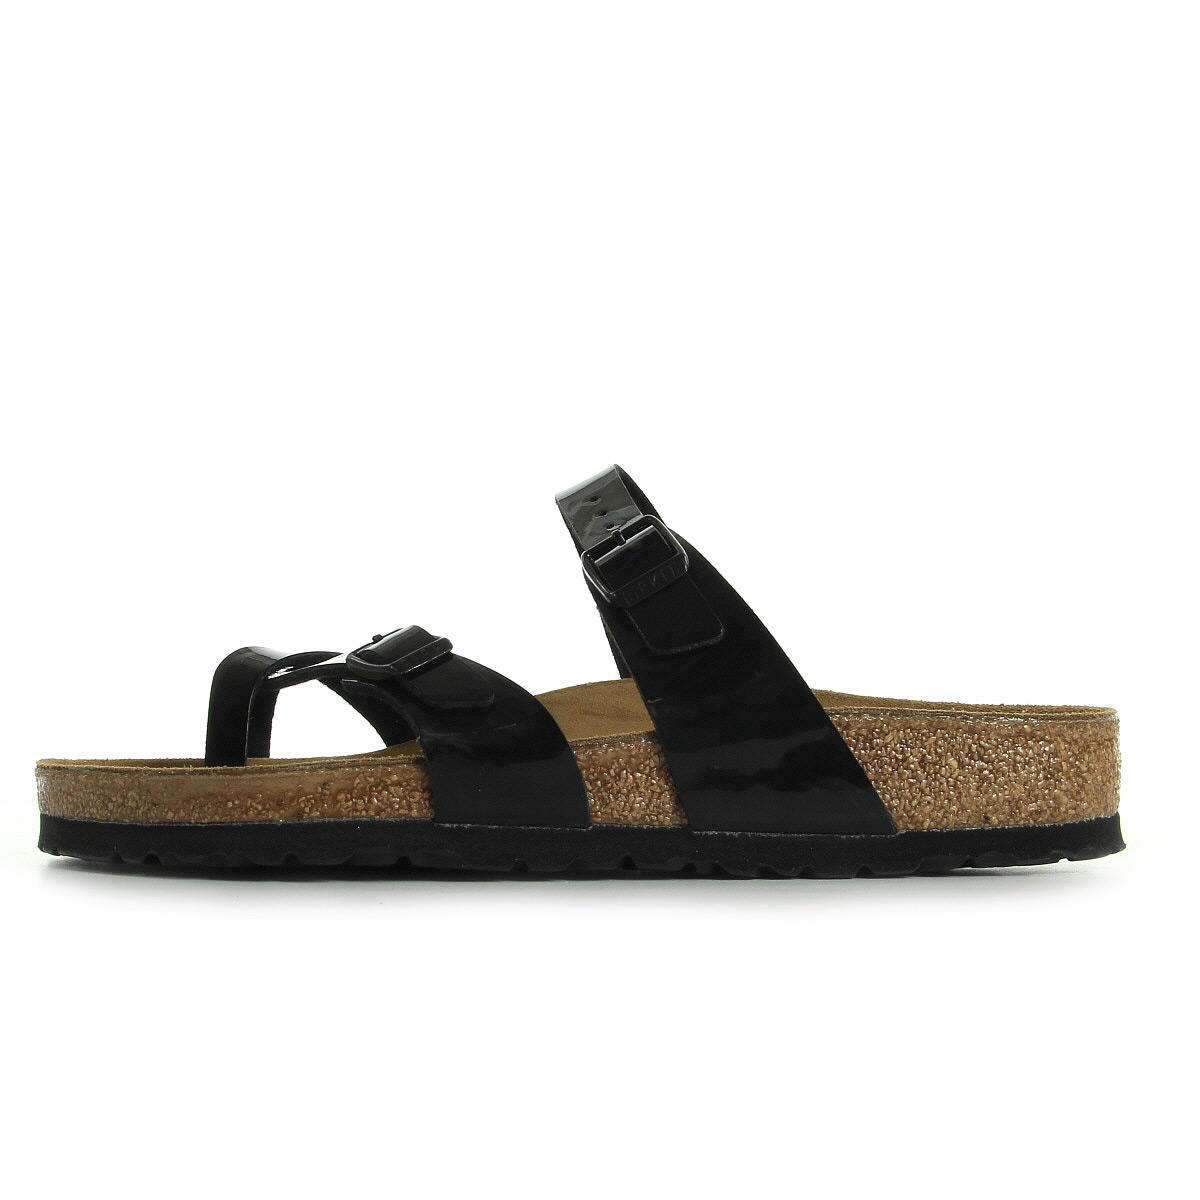 sandales nu pieds birkenstock femme mayari taille noir noire cuir a boucles ebay. Black Bedroom Furniture Sets. Home Design Ideas